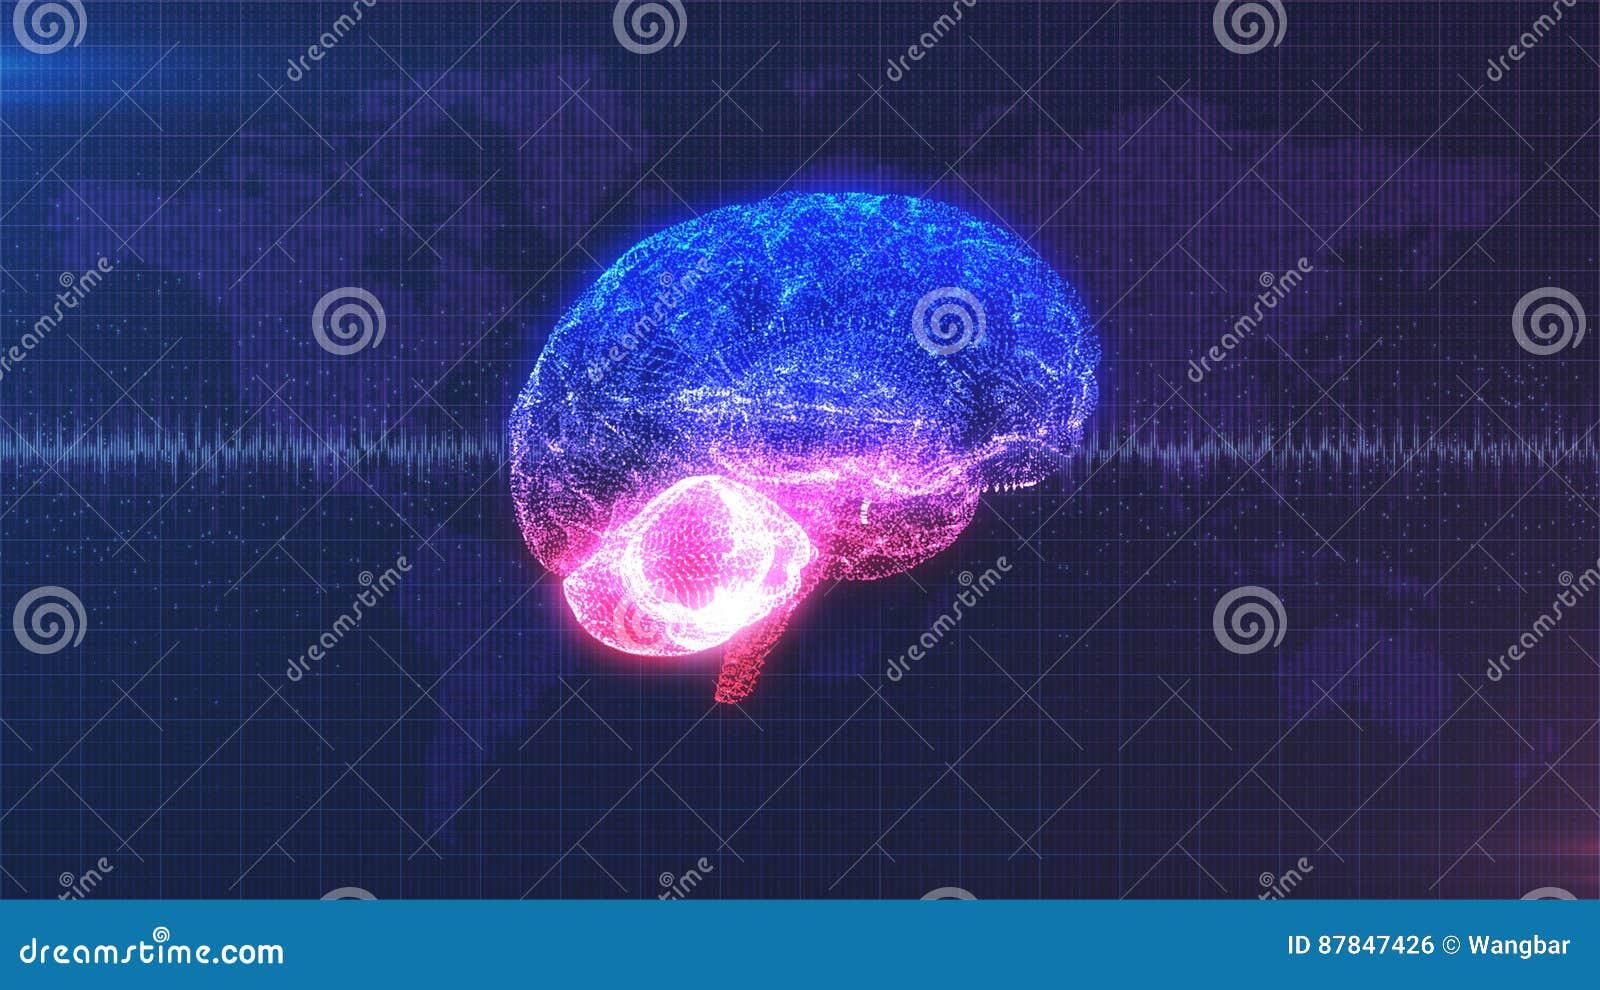 Brainstorm - pink, purple and blue brain with brainwave animation